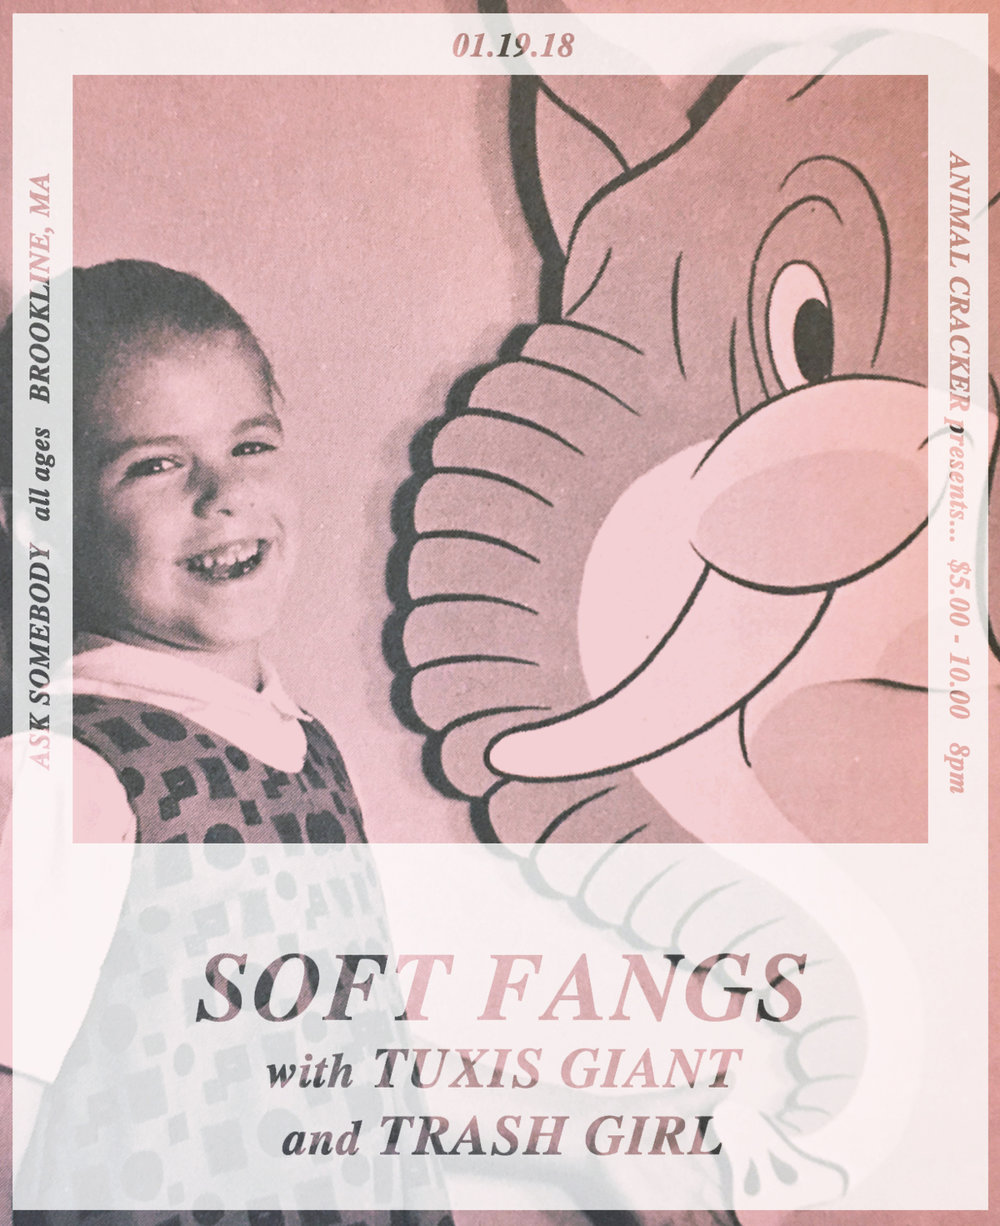 Flyer-SoftFangs011918-Pinks copy.jpg